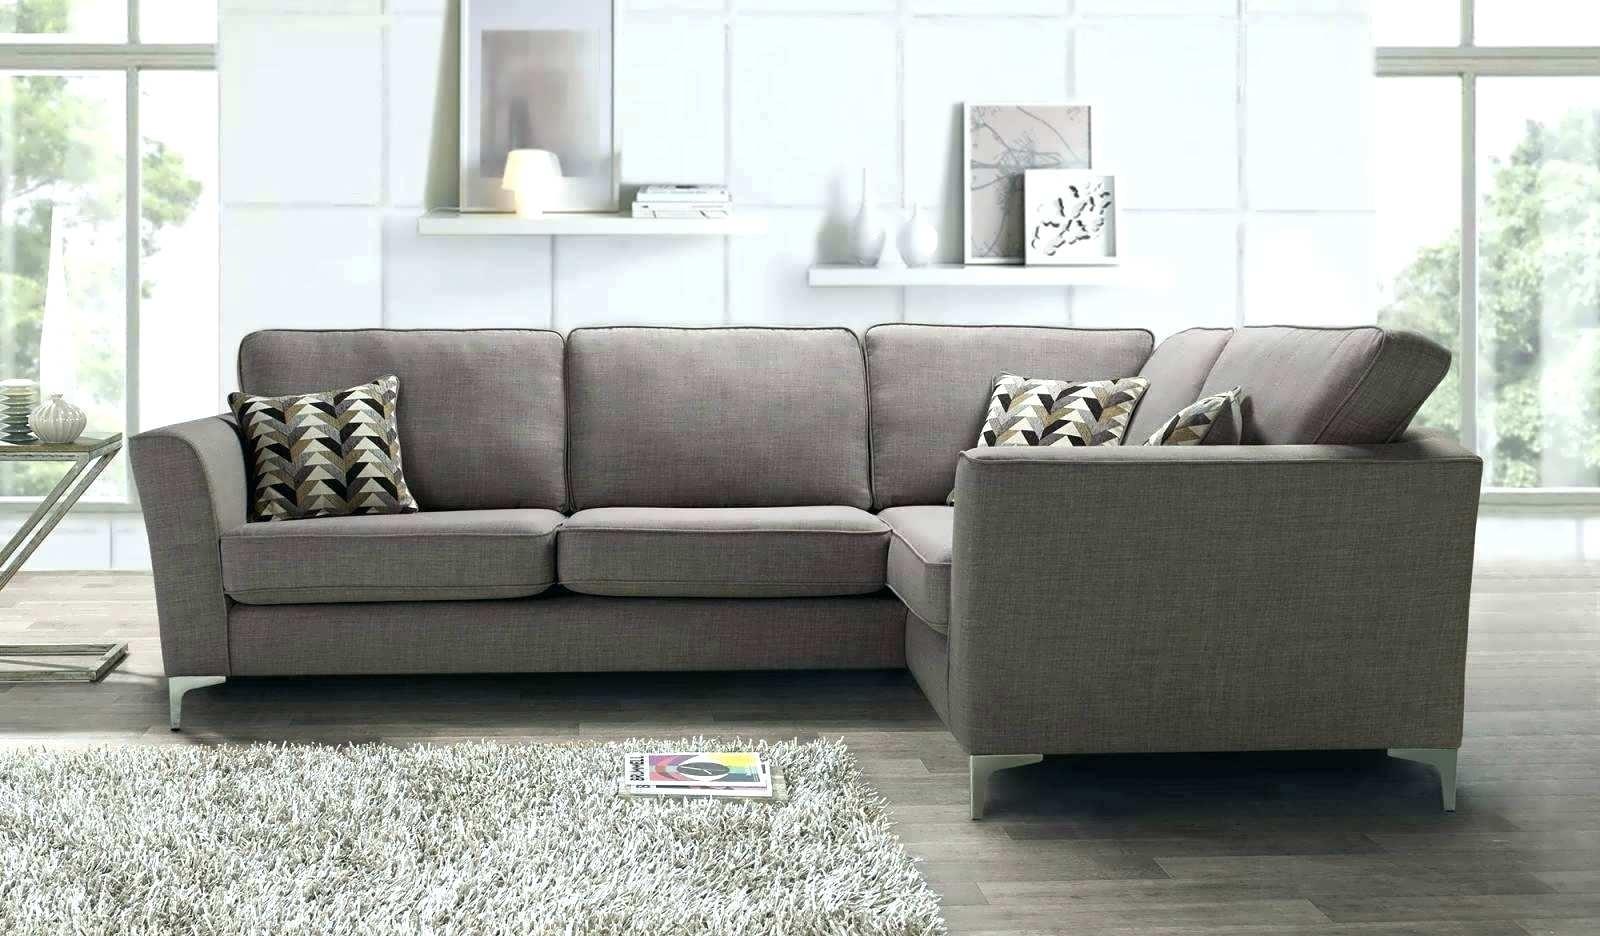 10 Top Canada Sale Sectional Sofas Sofa Ideas